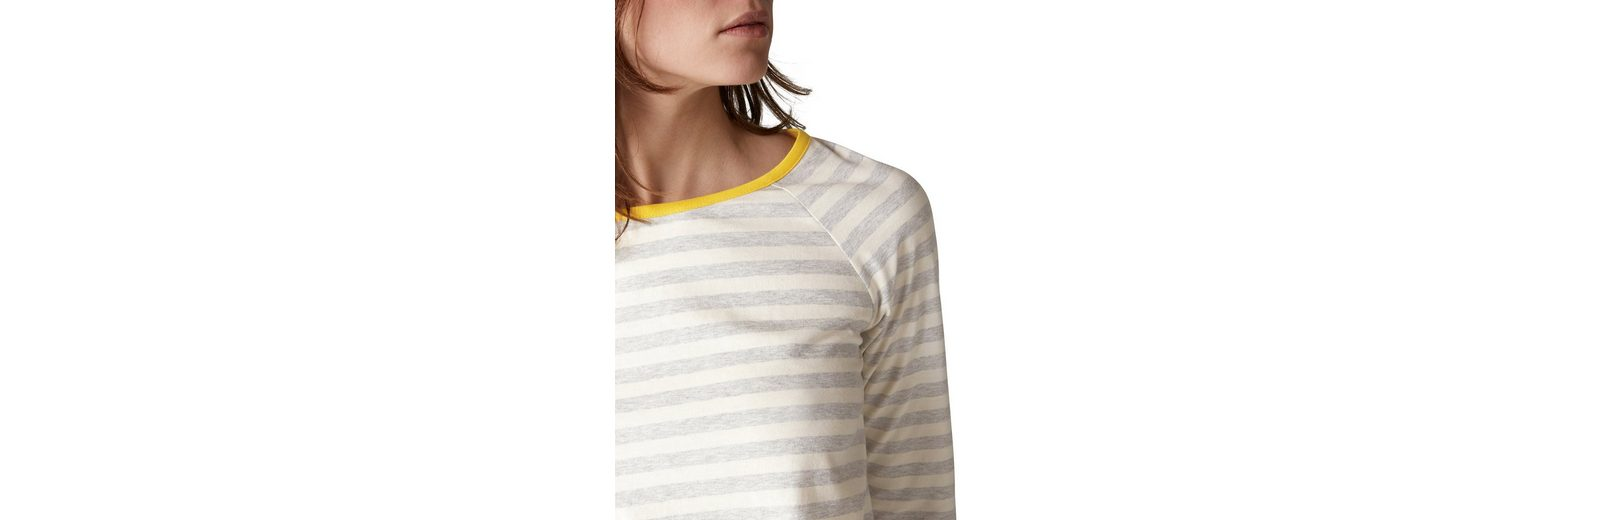 Marc O'Polo Langarmshirt Günstig Kaufen Perfekt CHzVsh